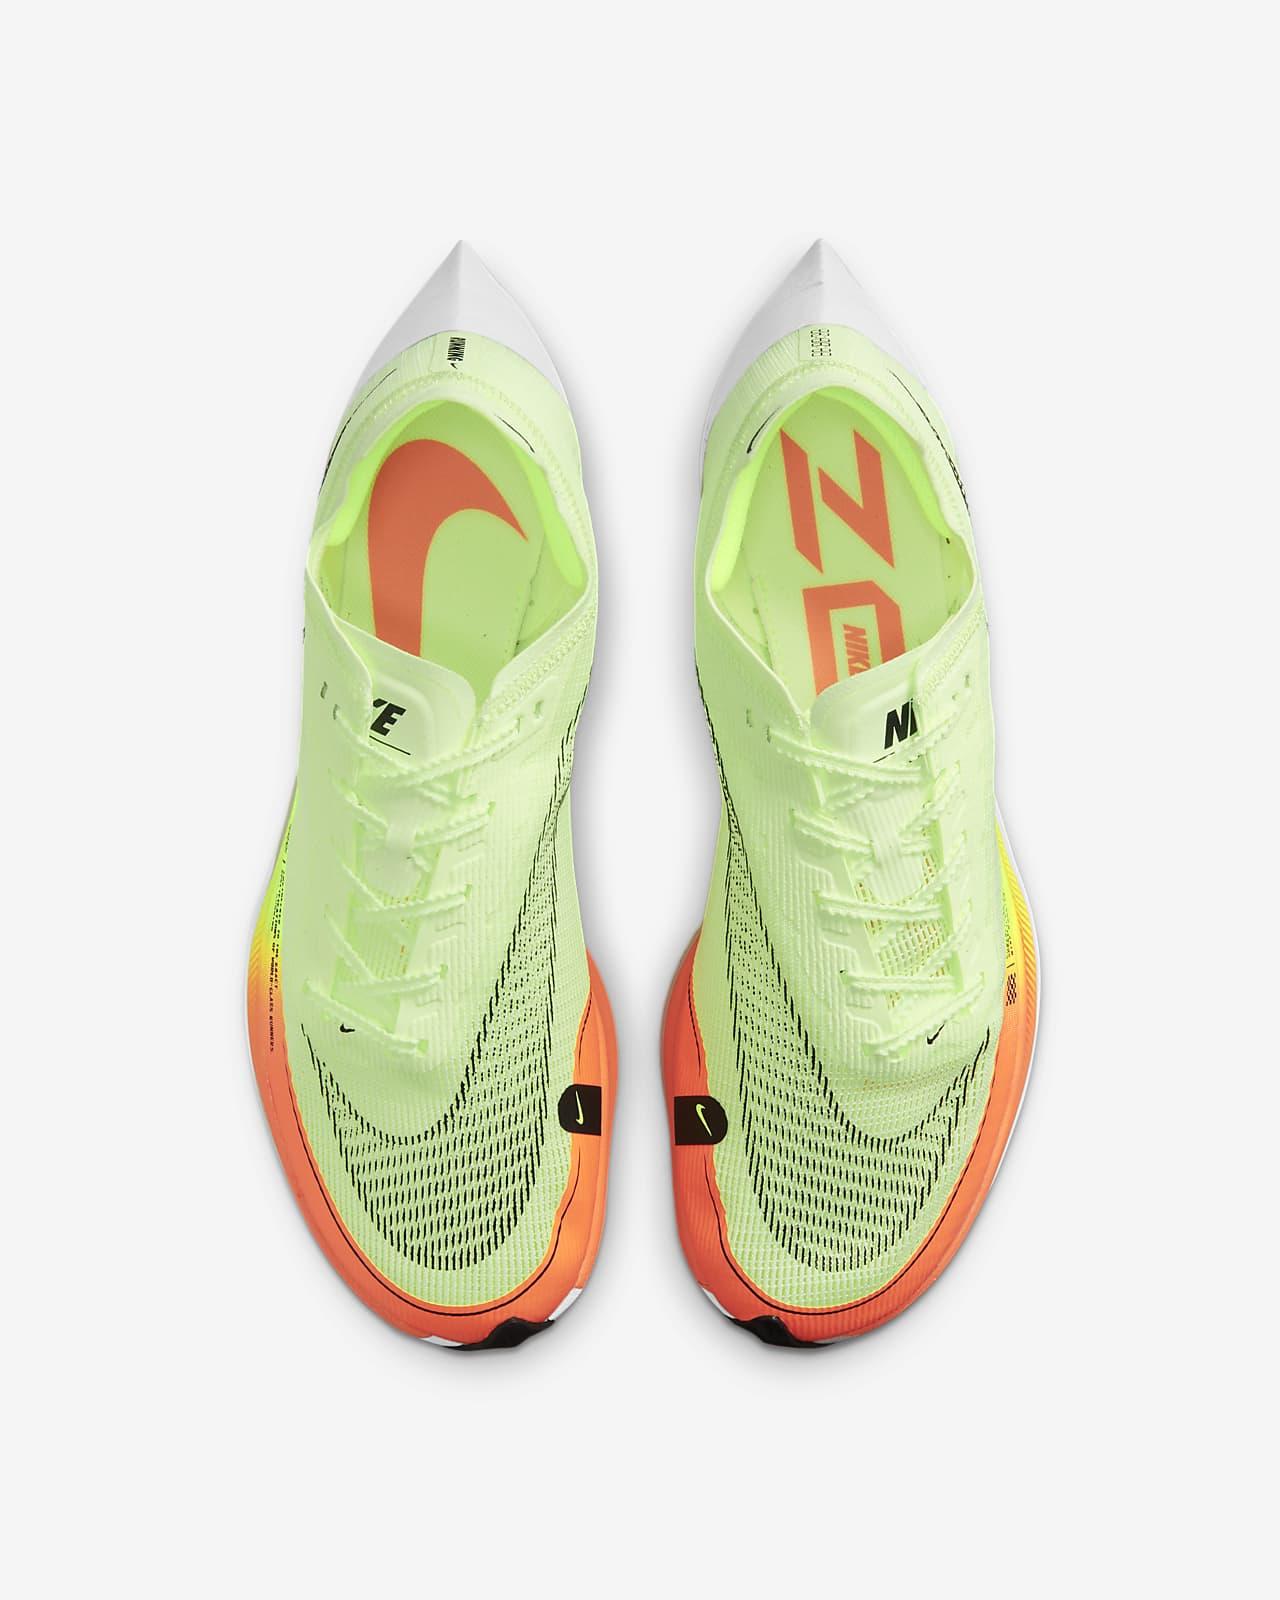 Chaussures de course Nike ZoomX Vaporfly Next% 2 pour Homme